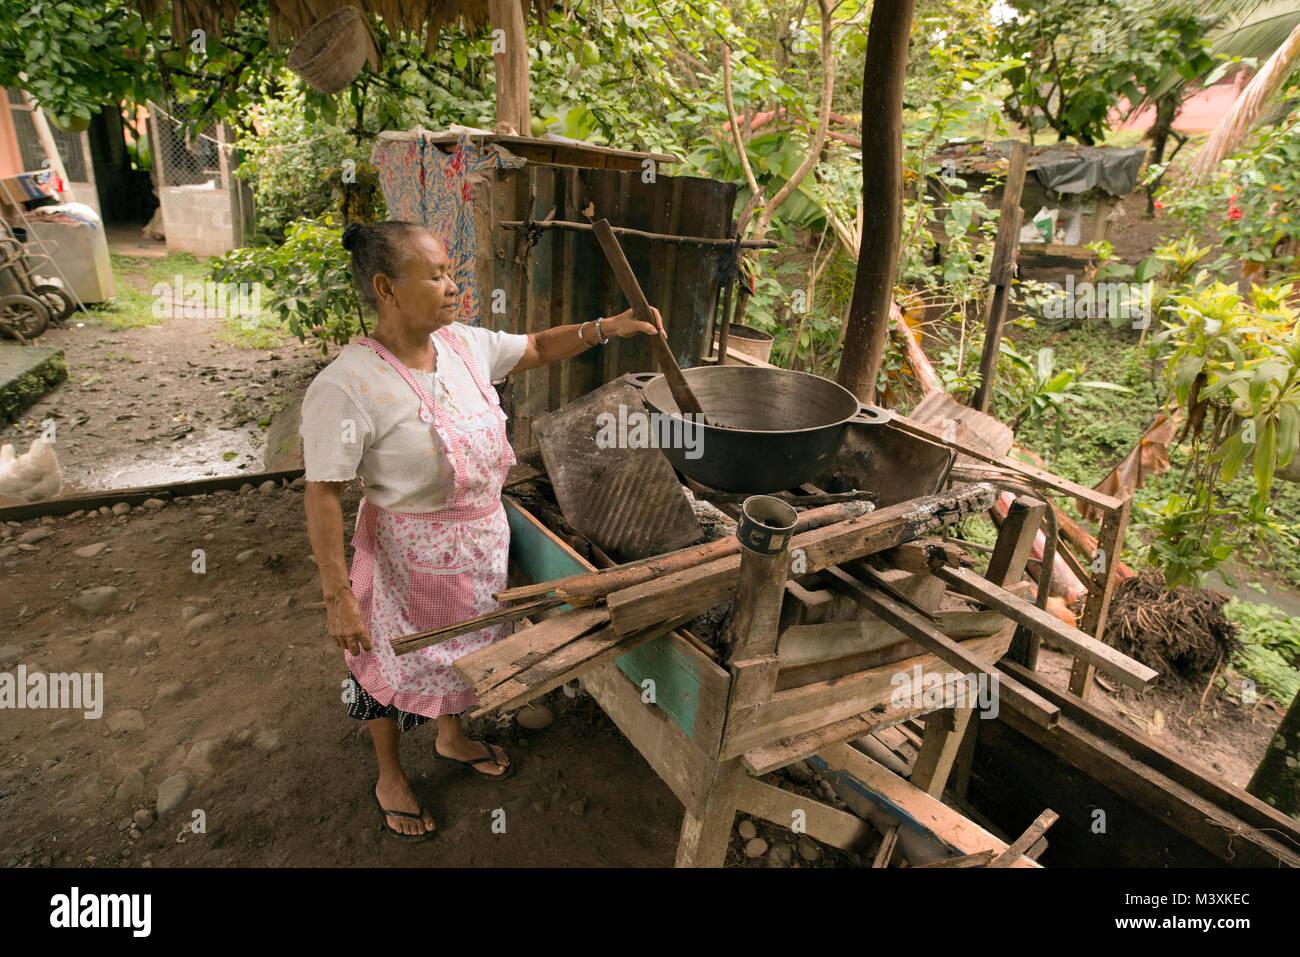 An elderly, indigenous Bribri lady roasts cocoa beans. - Stock Image